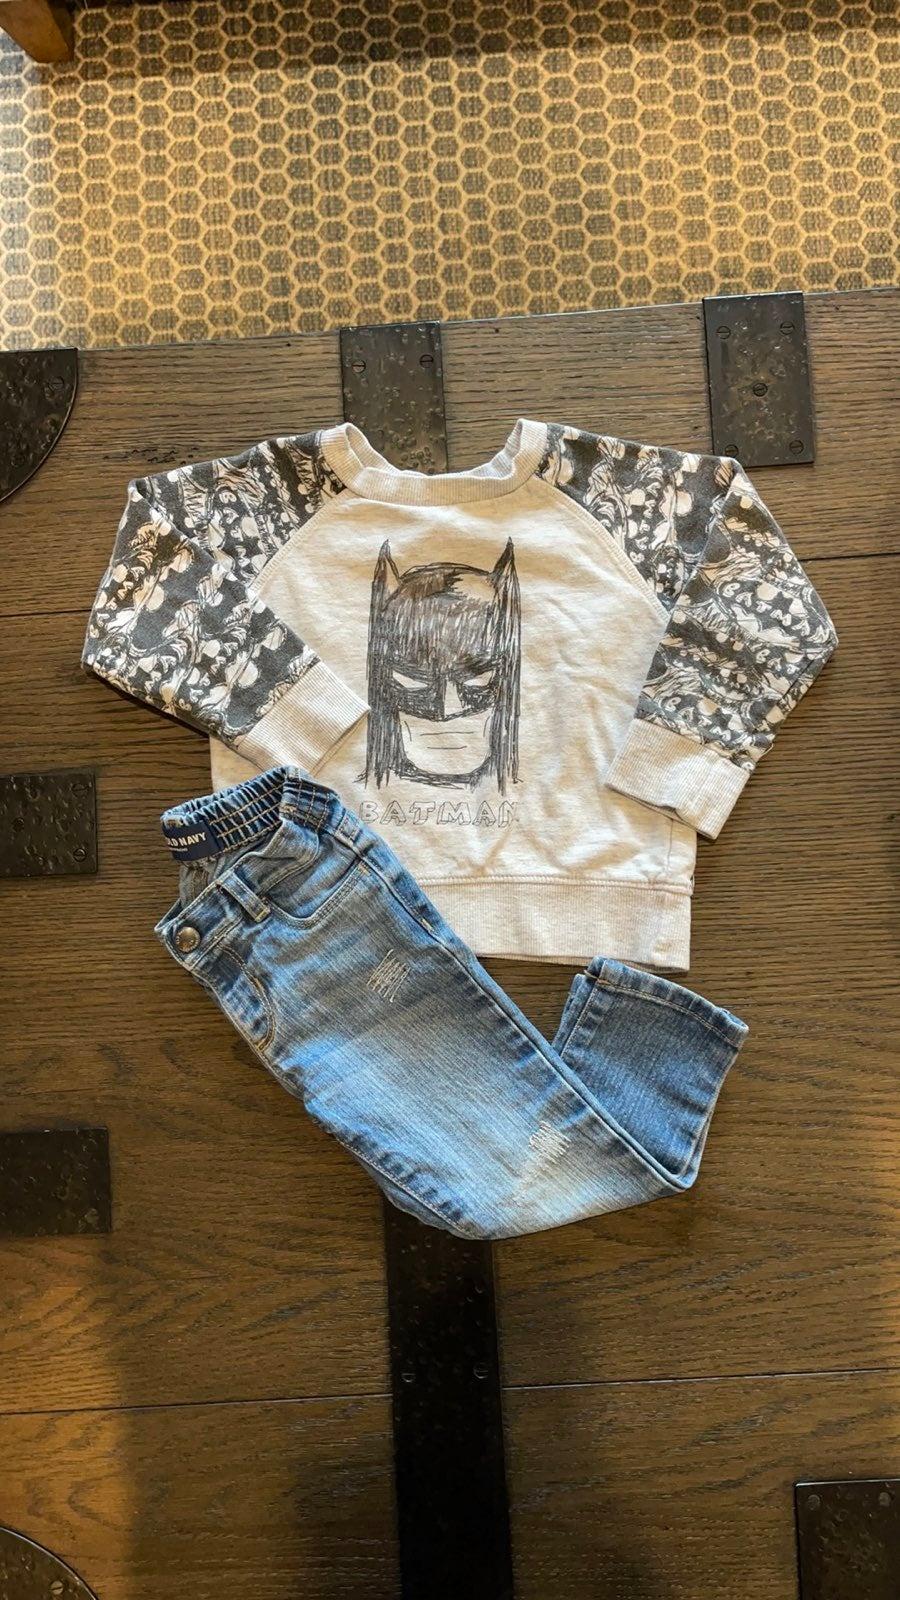 Batman Sweatshirt and Jeans